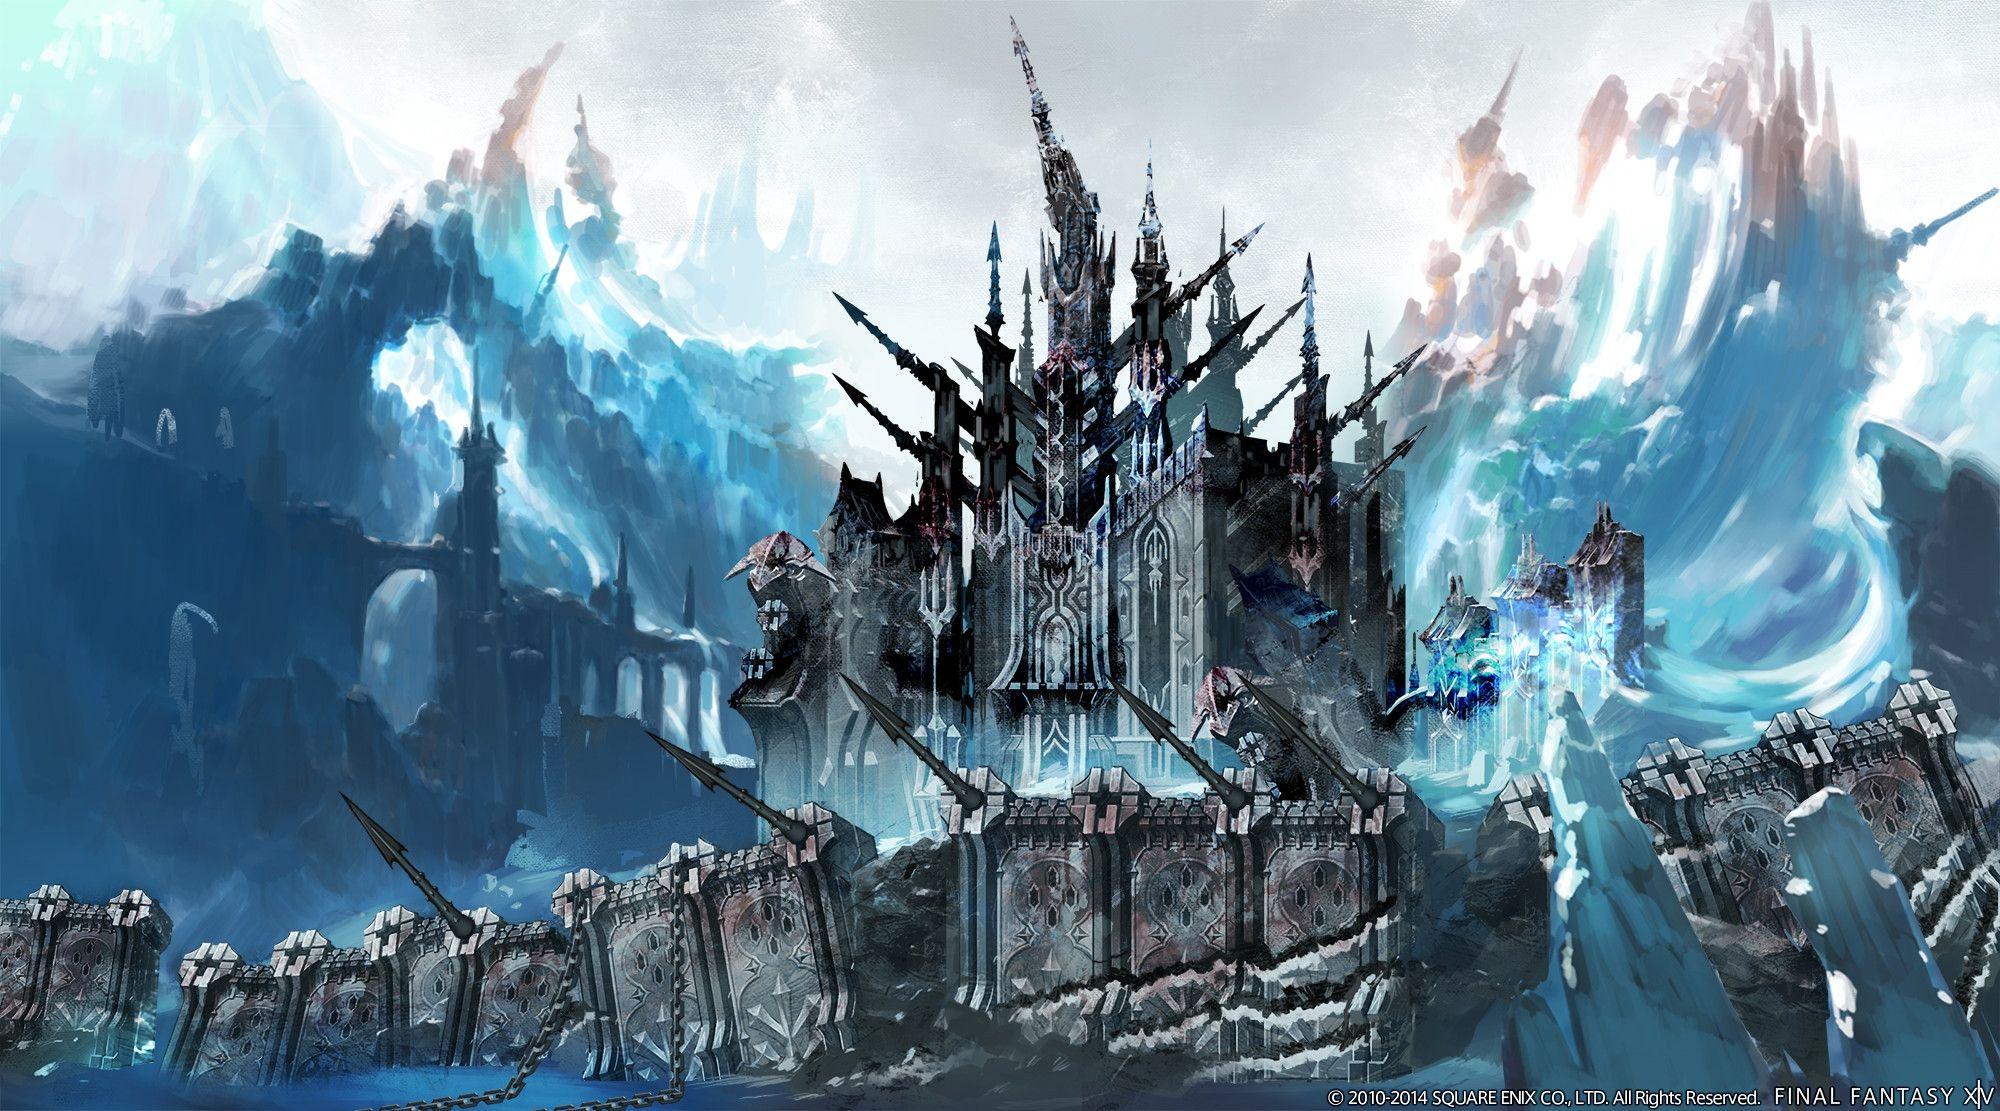 Final Fantasy Xiv A Realm Reborn Final Fantasy Pinterest